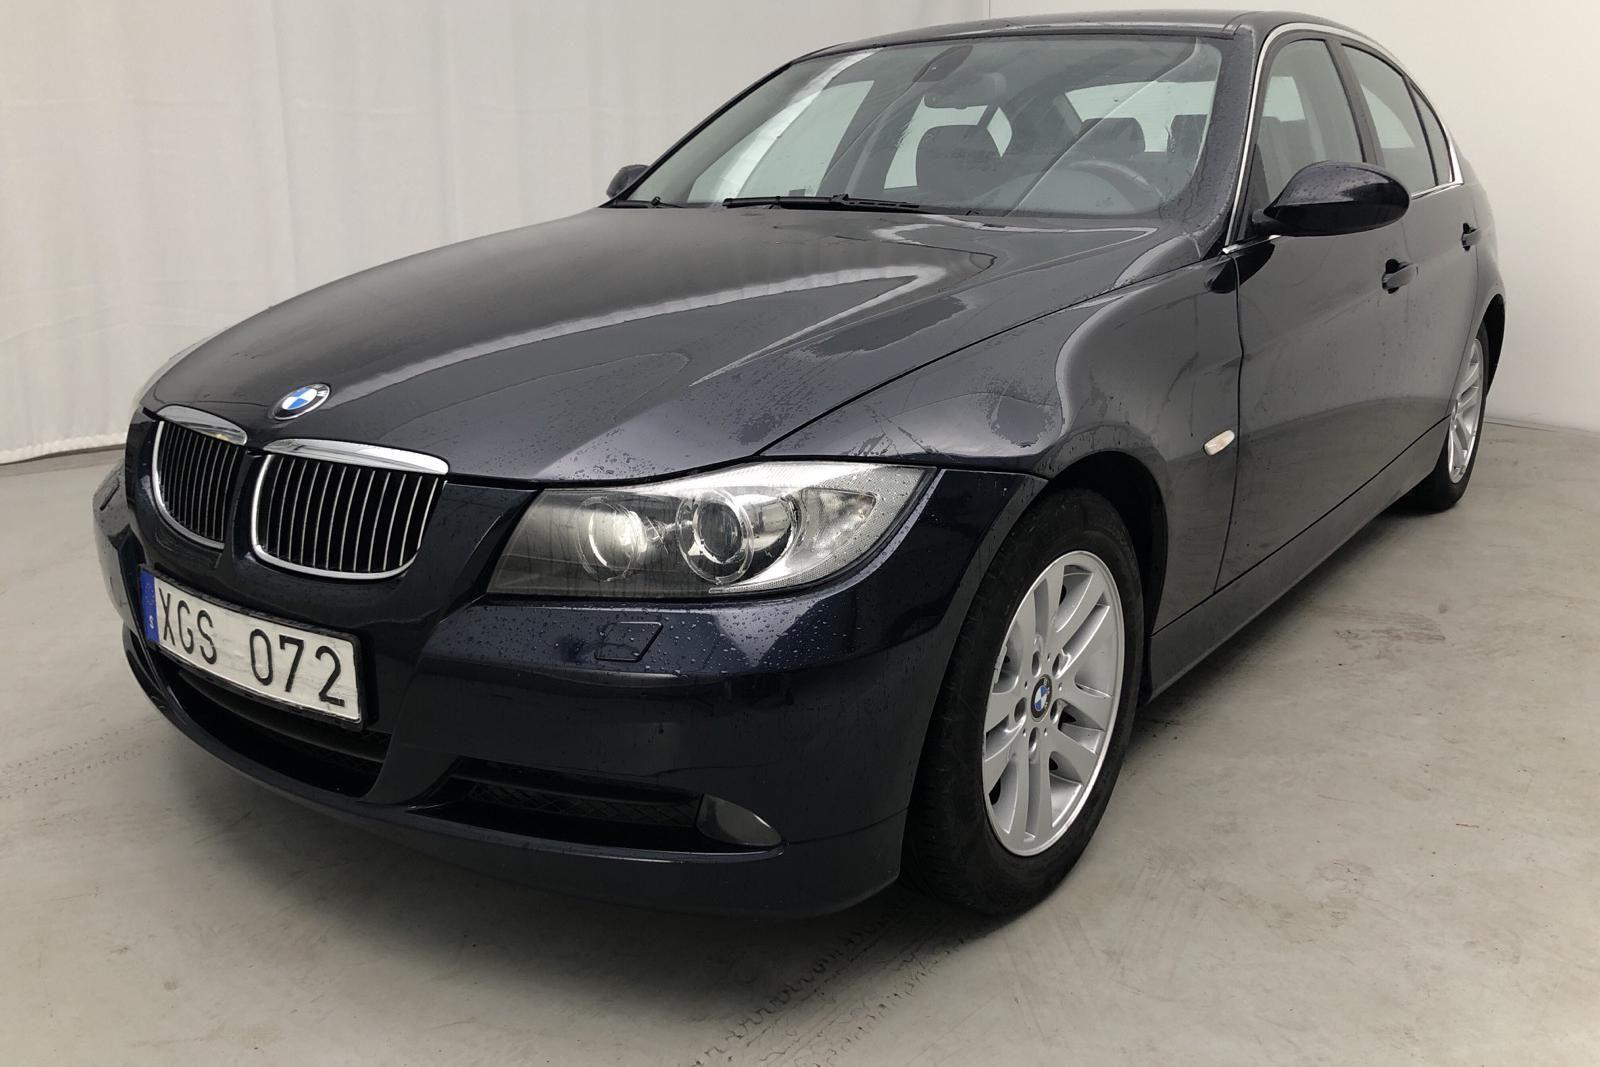 BMW 325xi Limousine, E90 (218 PS)